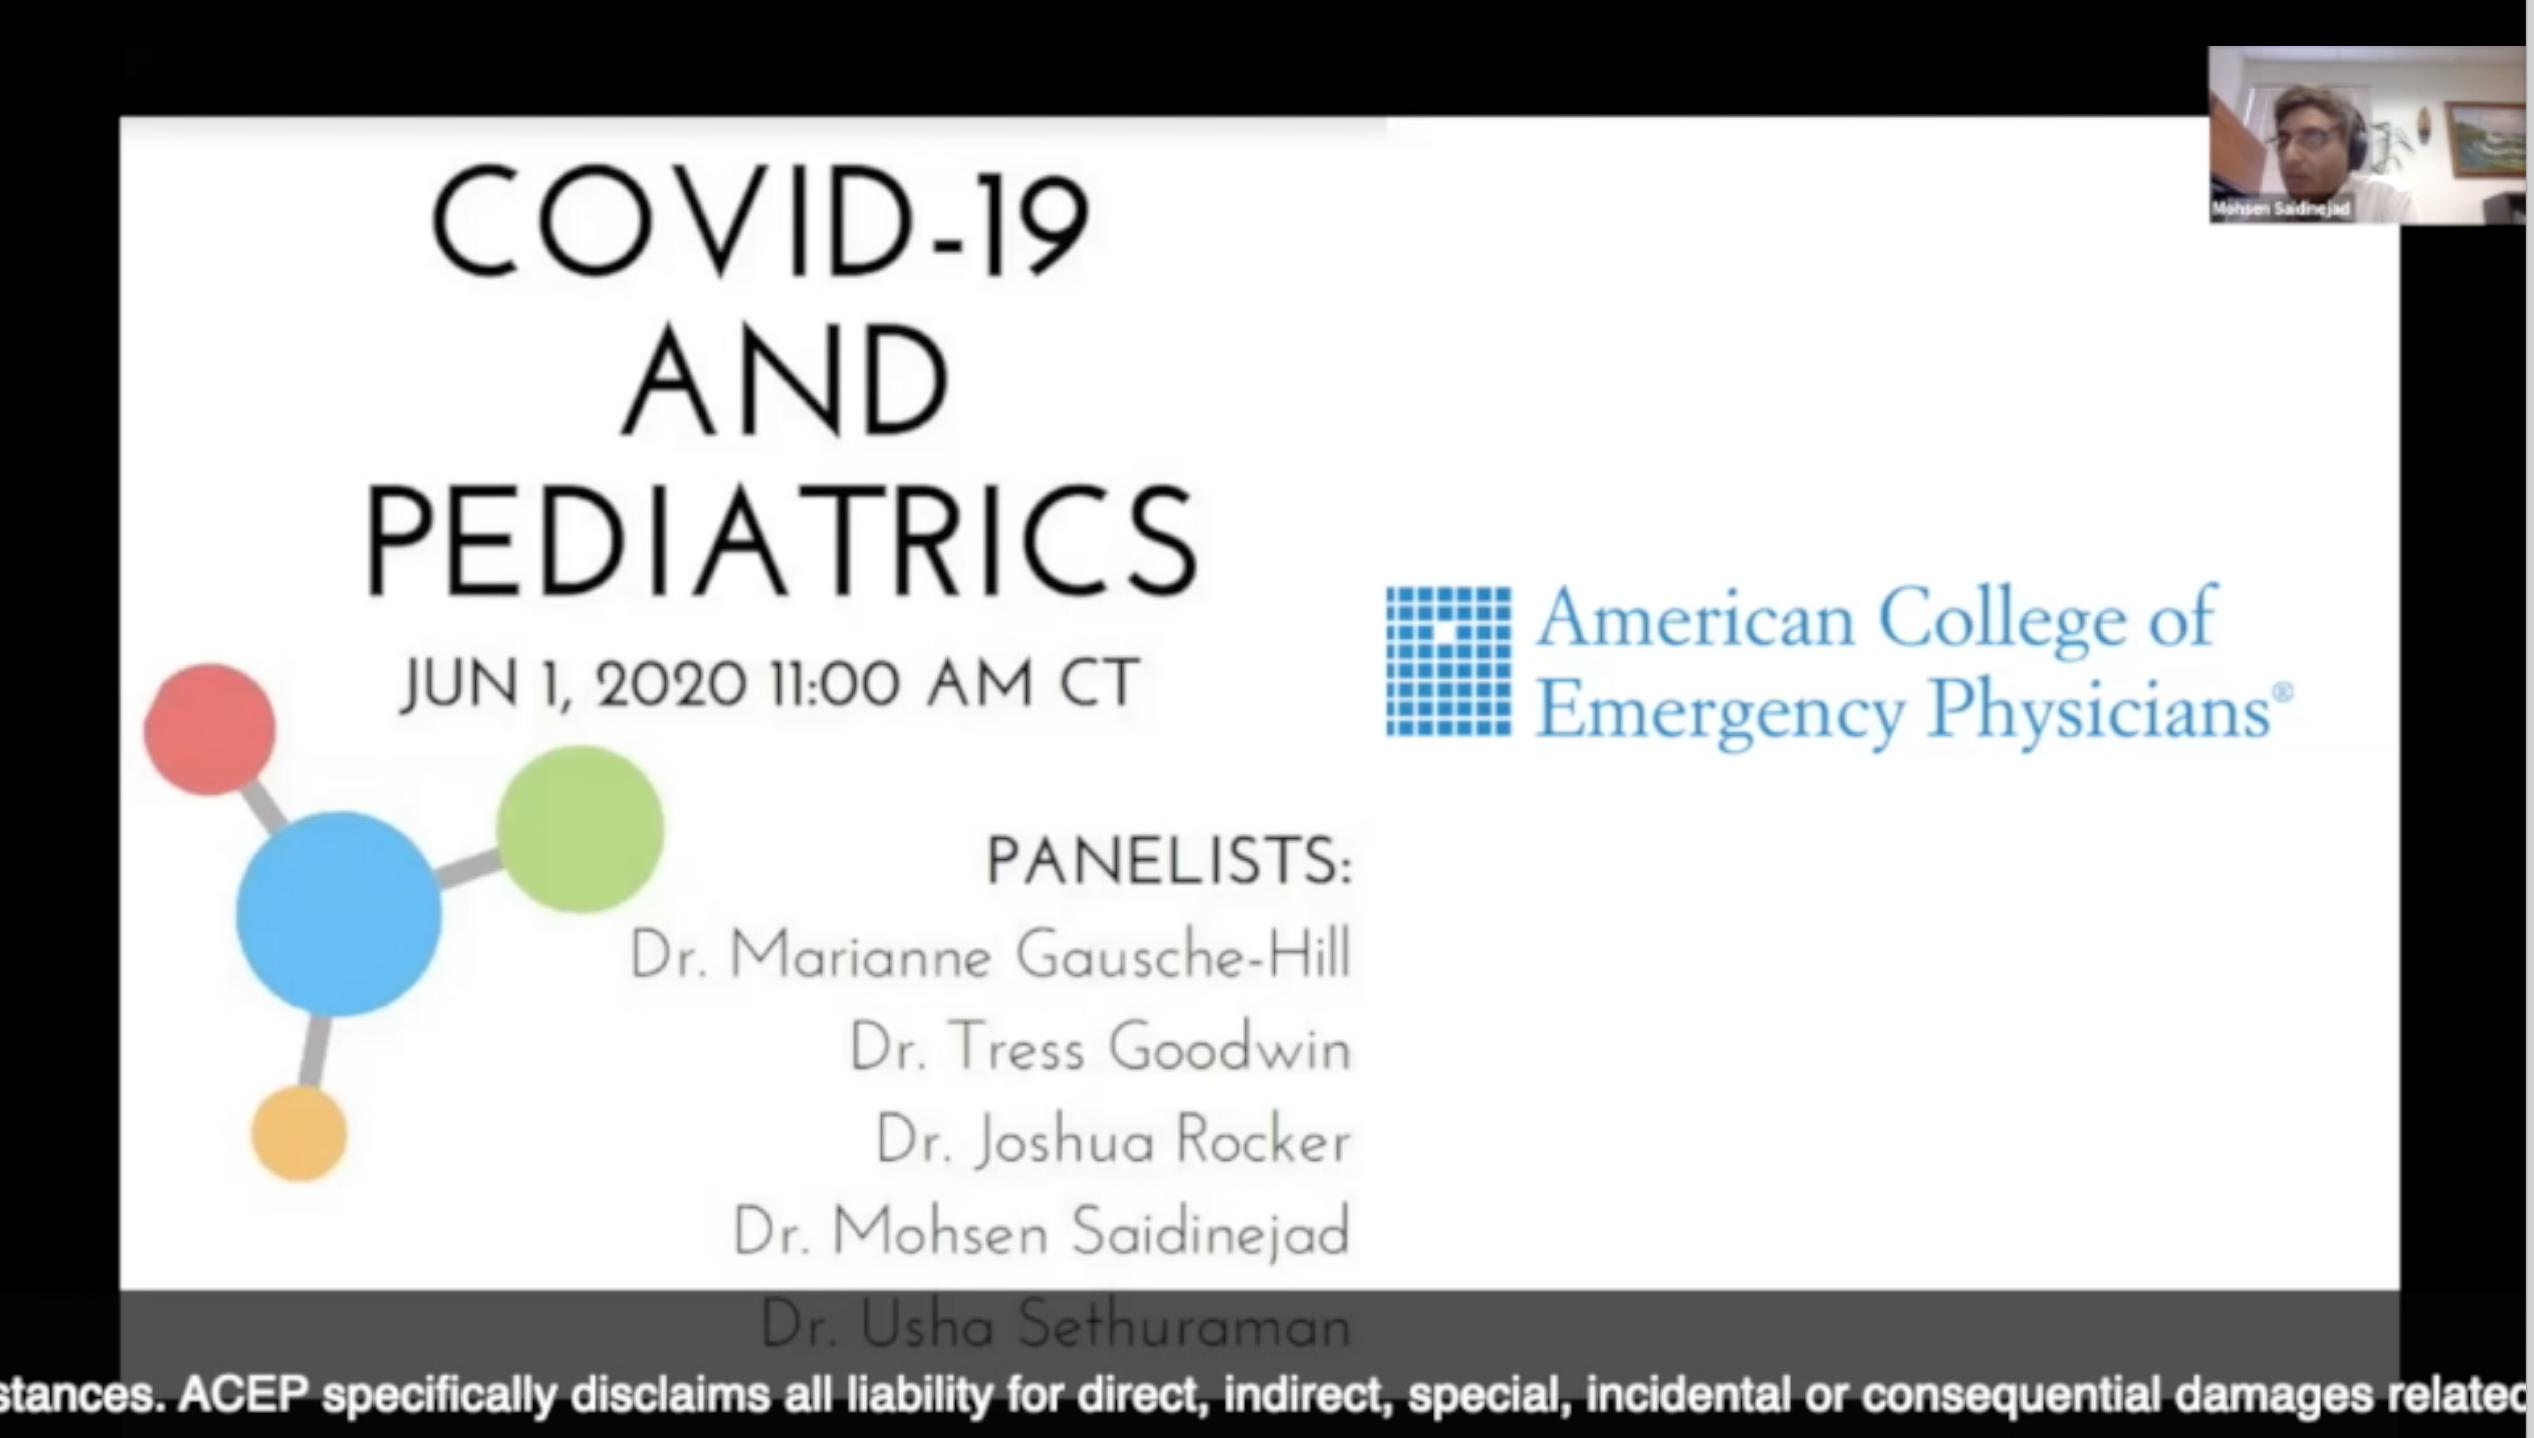 ACEP COVID-19 and Pediatrics Webinar